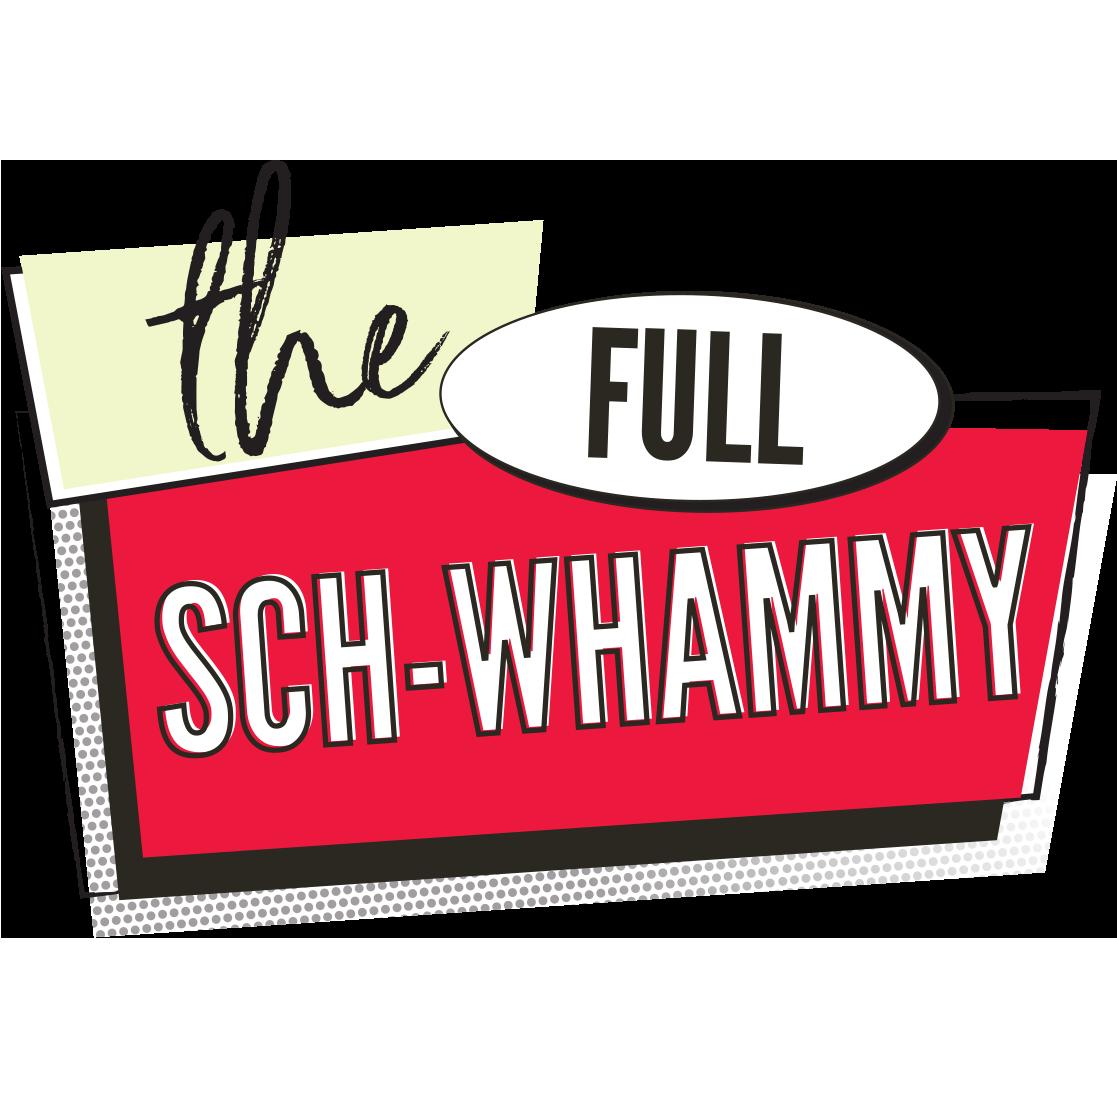 full-sch-whammy